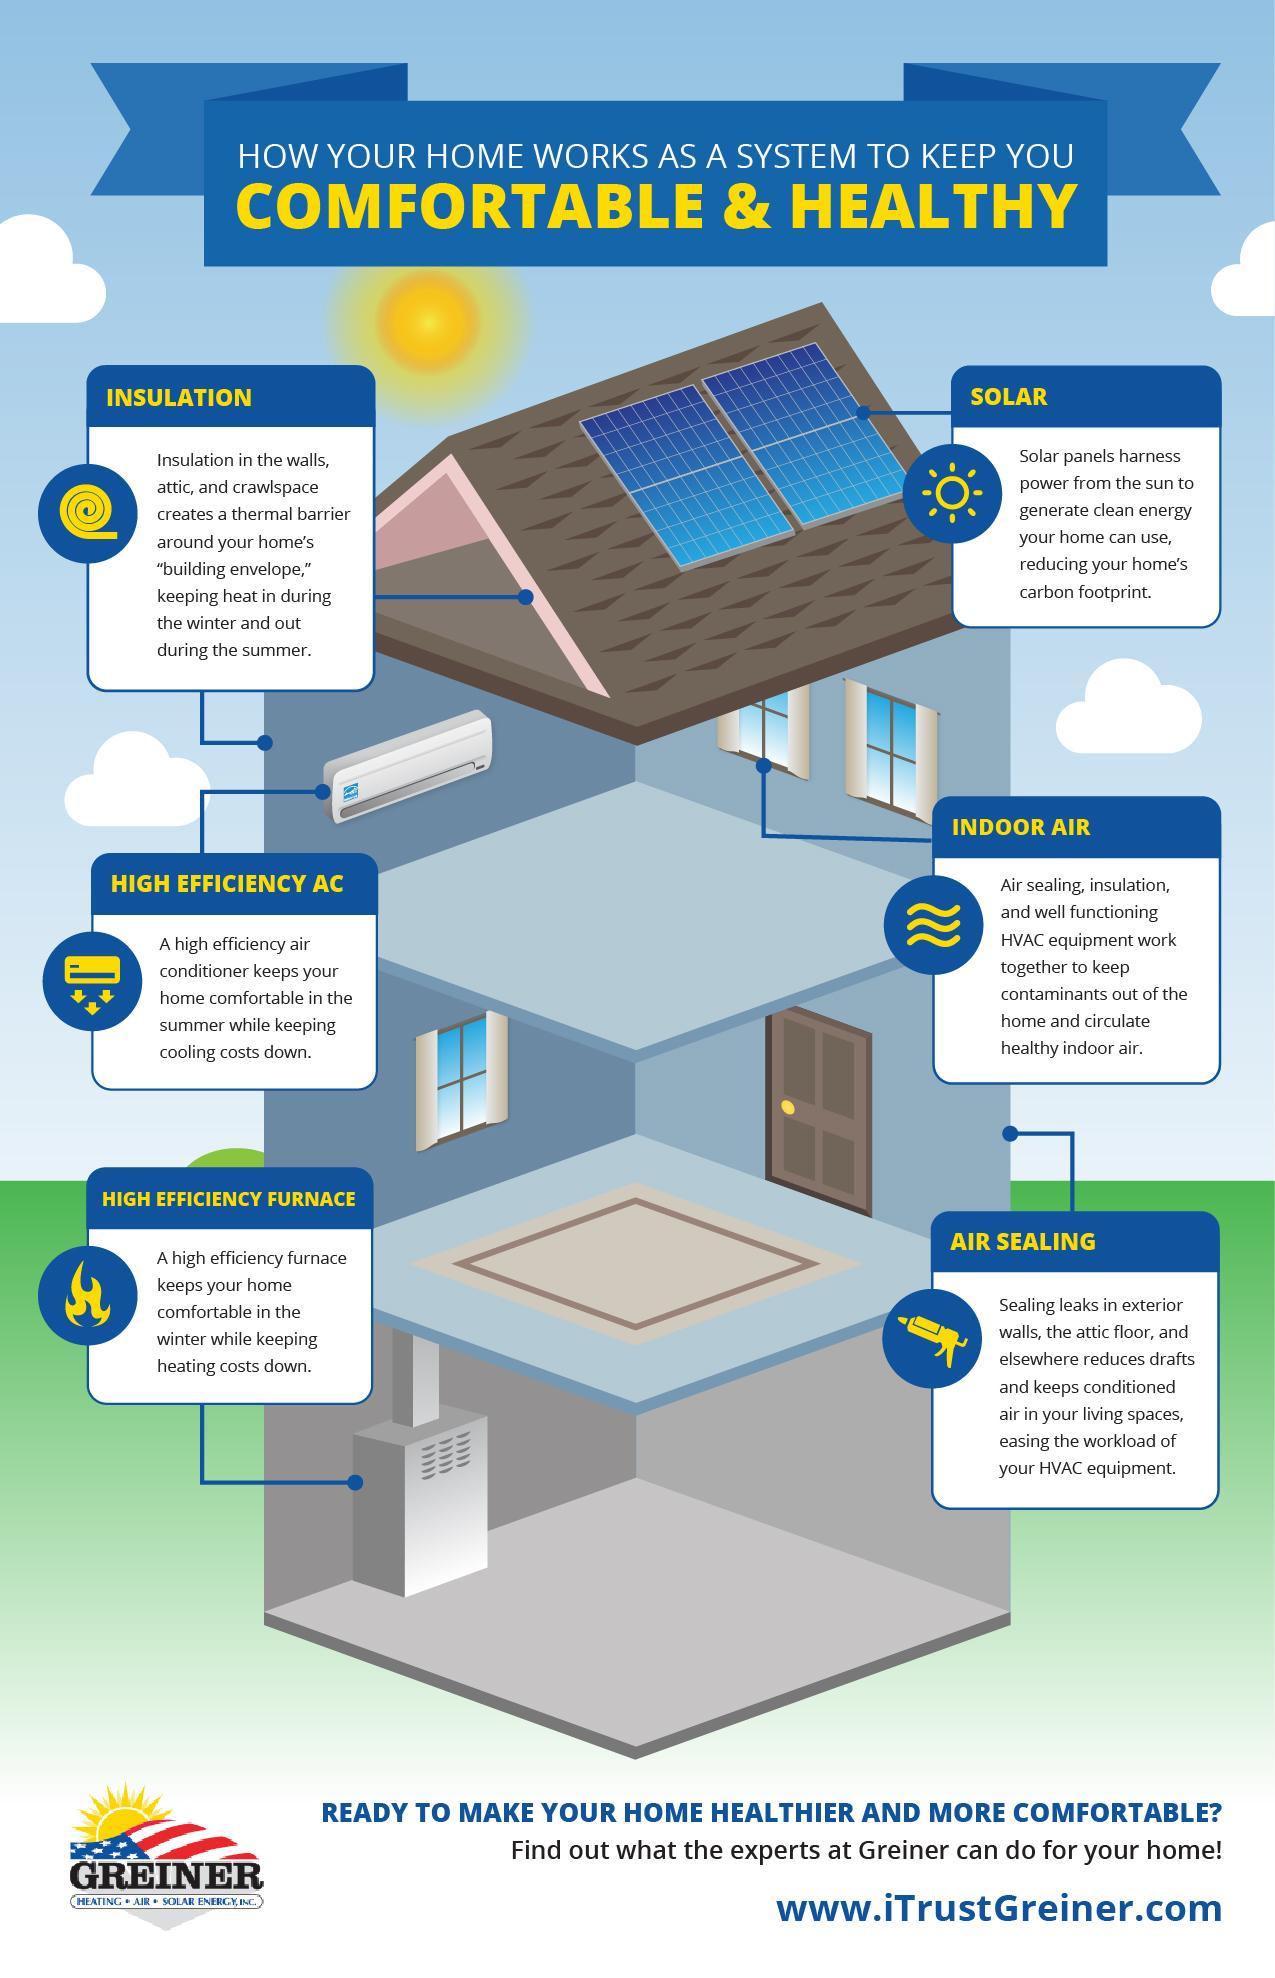 air sealing insulation furnace ac hvac iaq solar ghac [ 1275 x 1978 Pixel ]